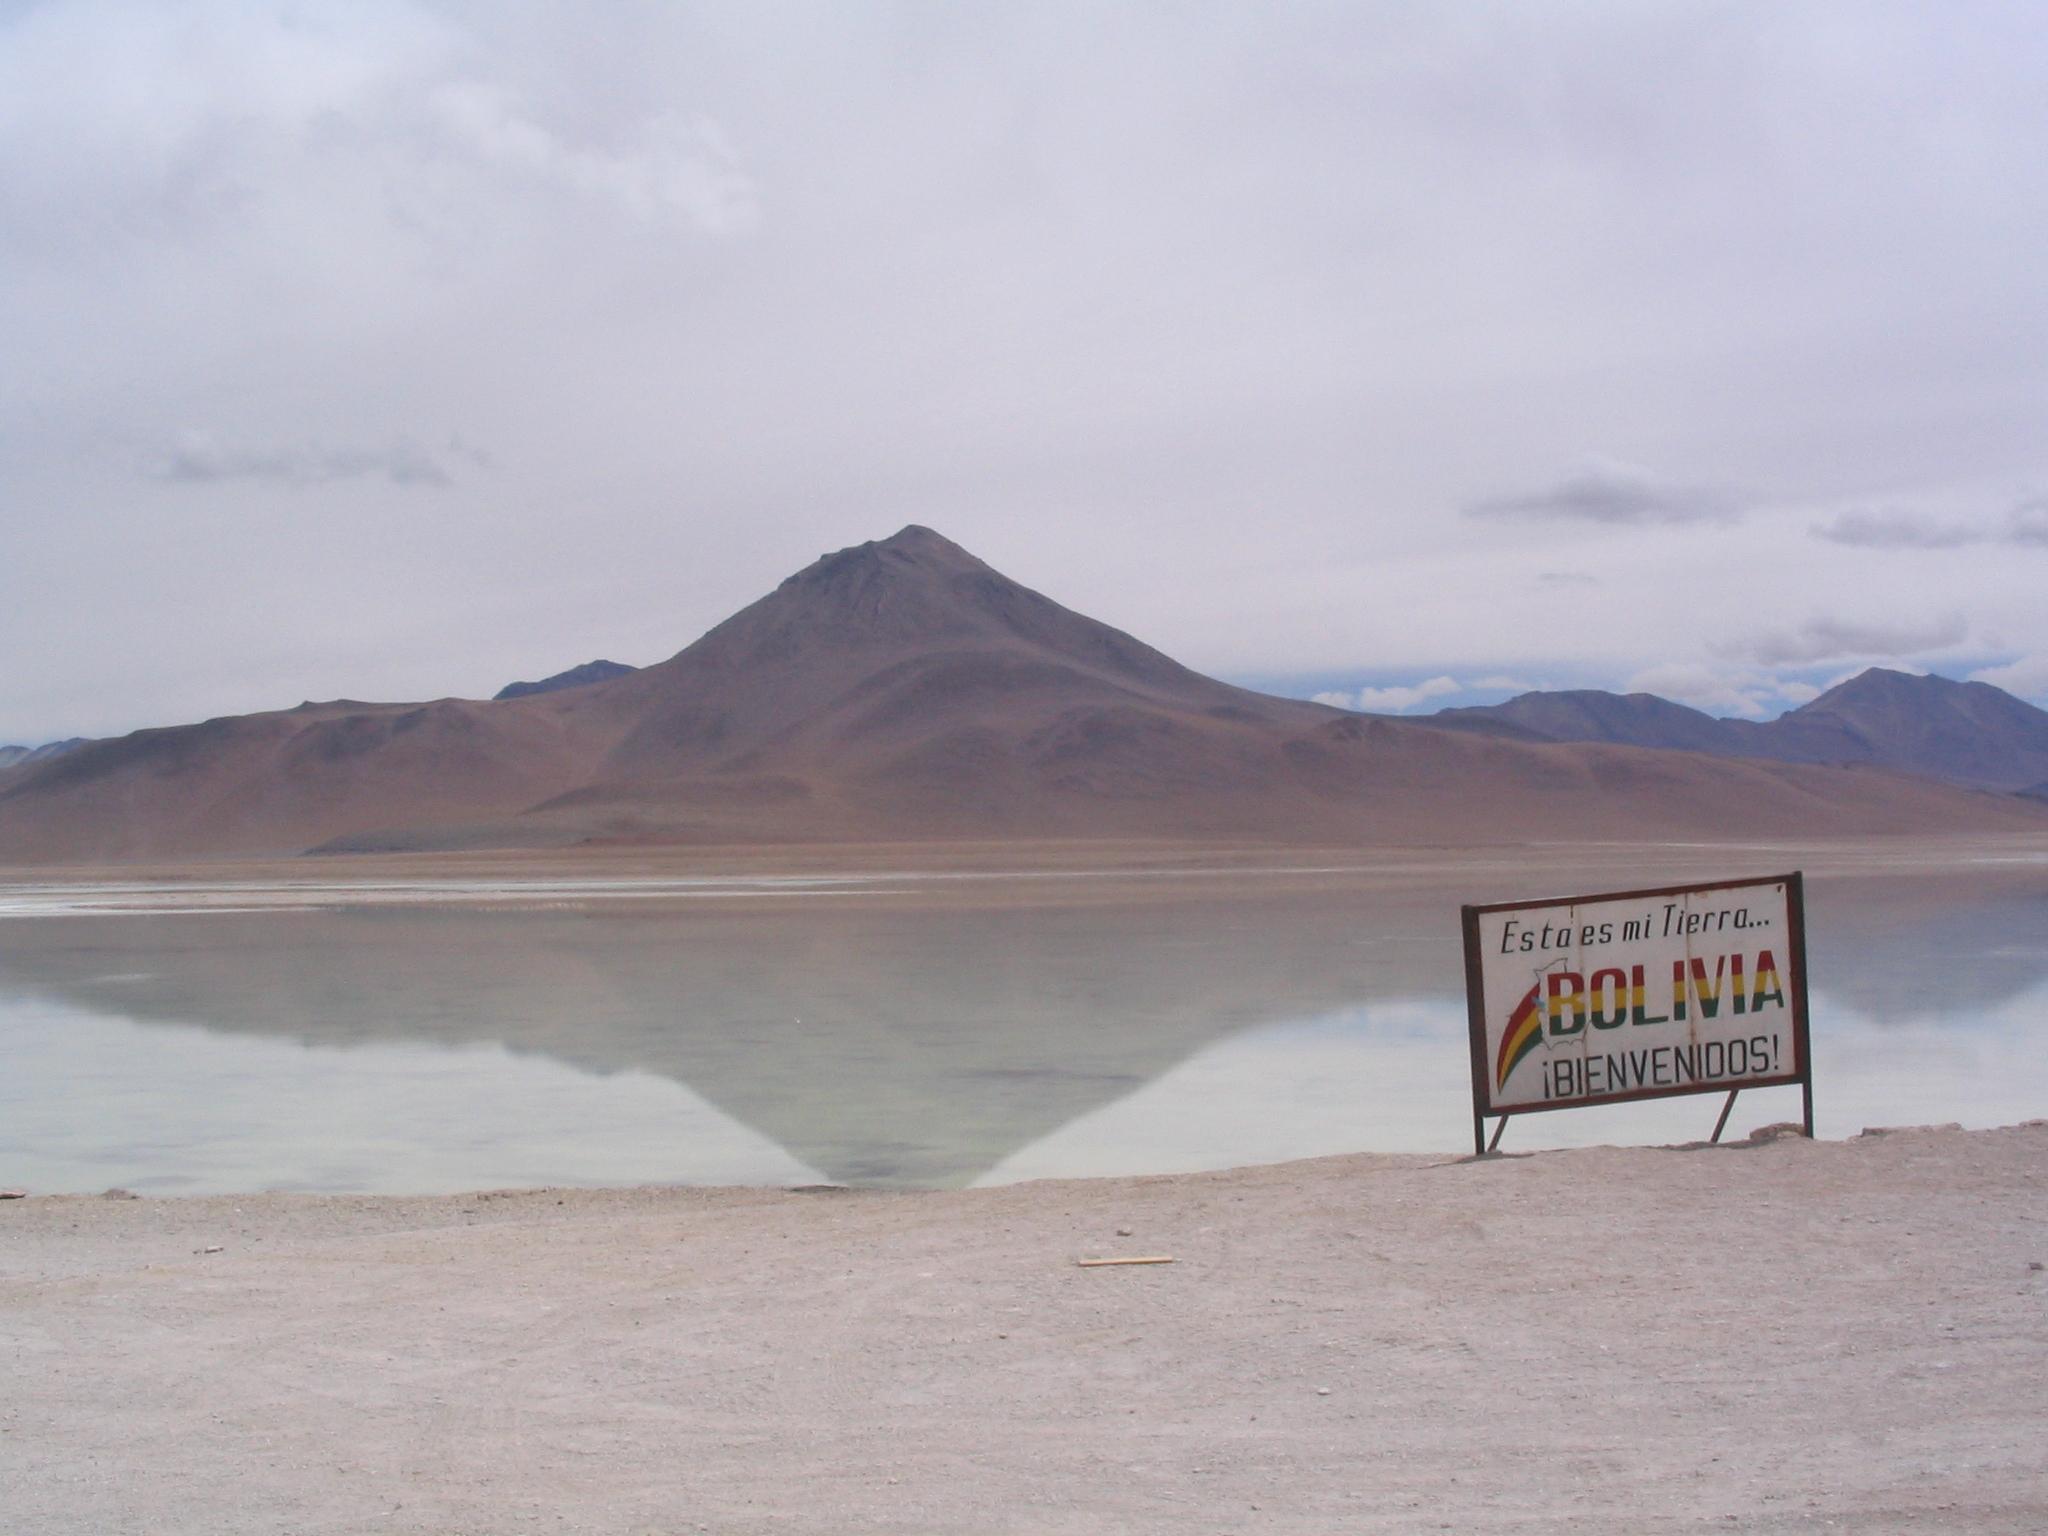 File:Laguna Blanca (Bolivia).jpg - Wikipedia  File:Laguna Bla...